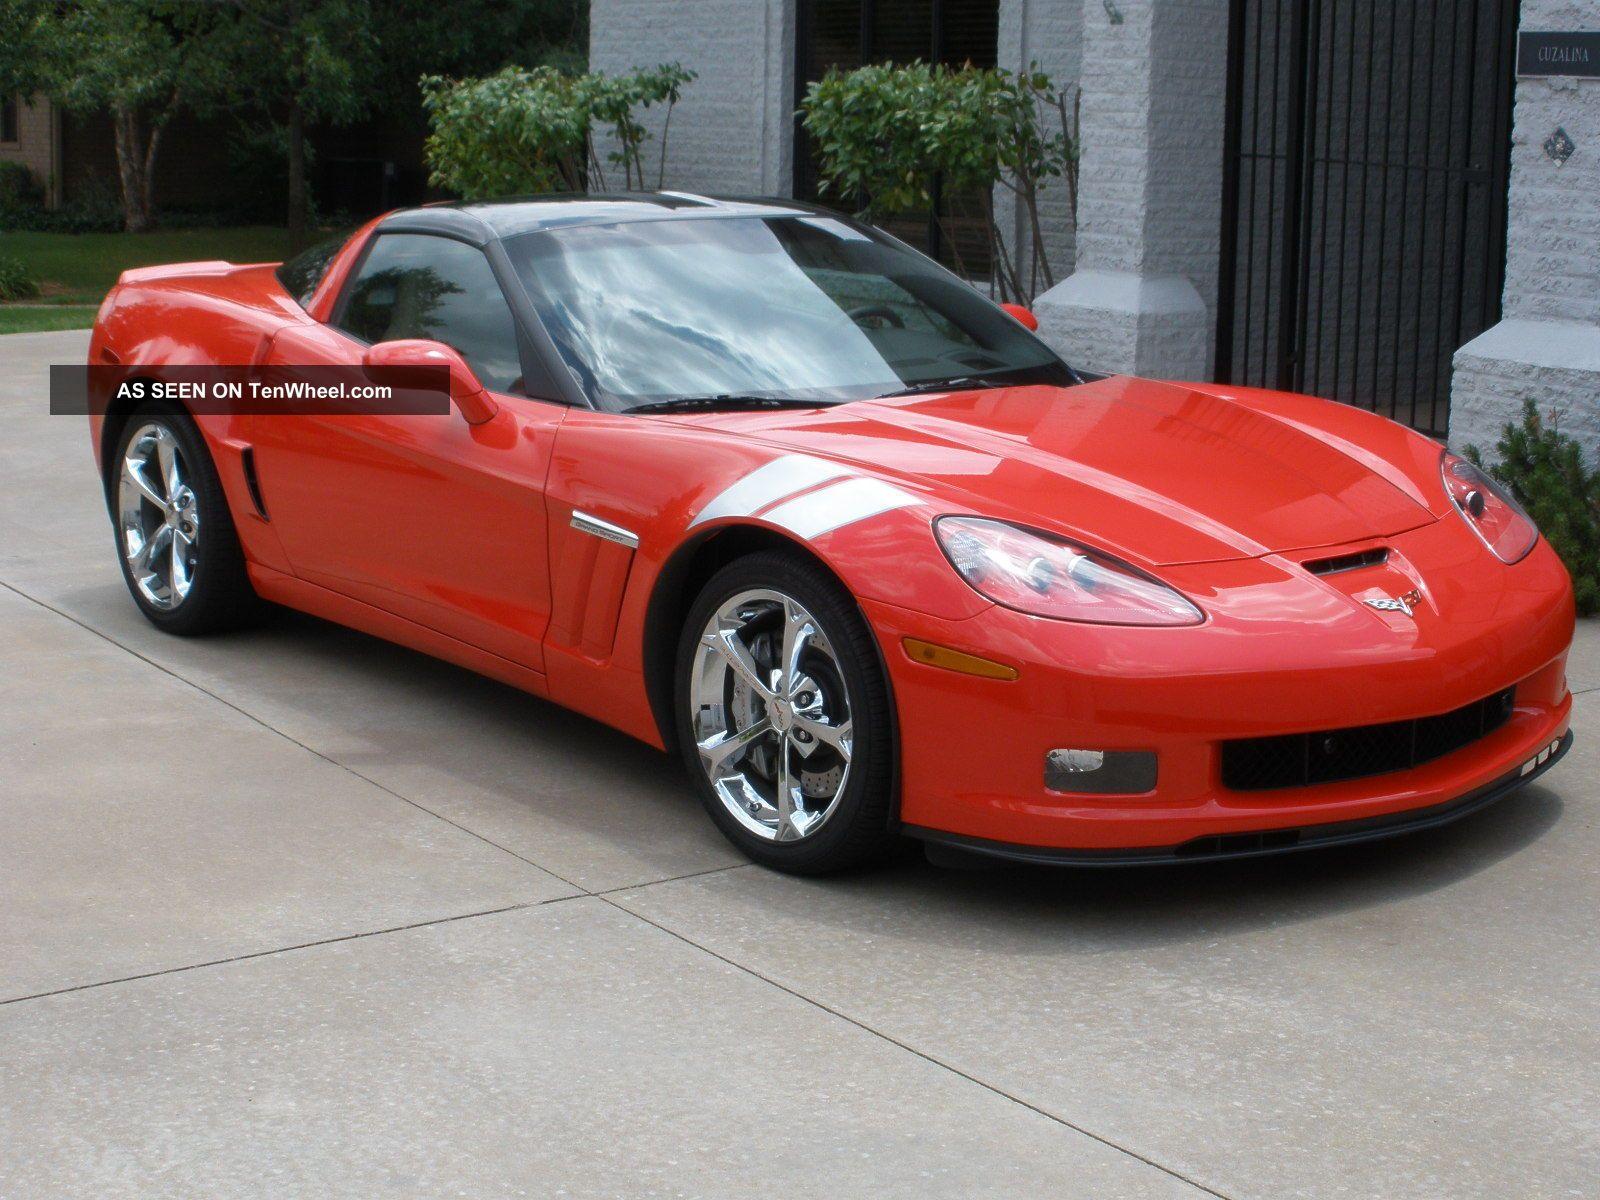 2011 corvette grand sport coupe red tan auto 3lt npp. Black Bedroom Furniture Sets. Home Design Ideas